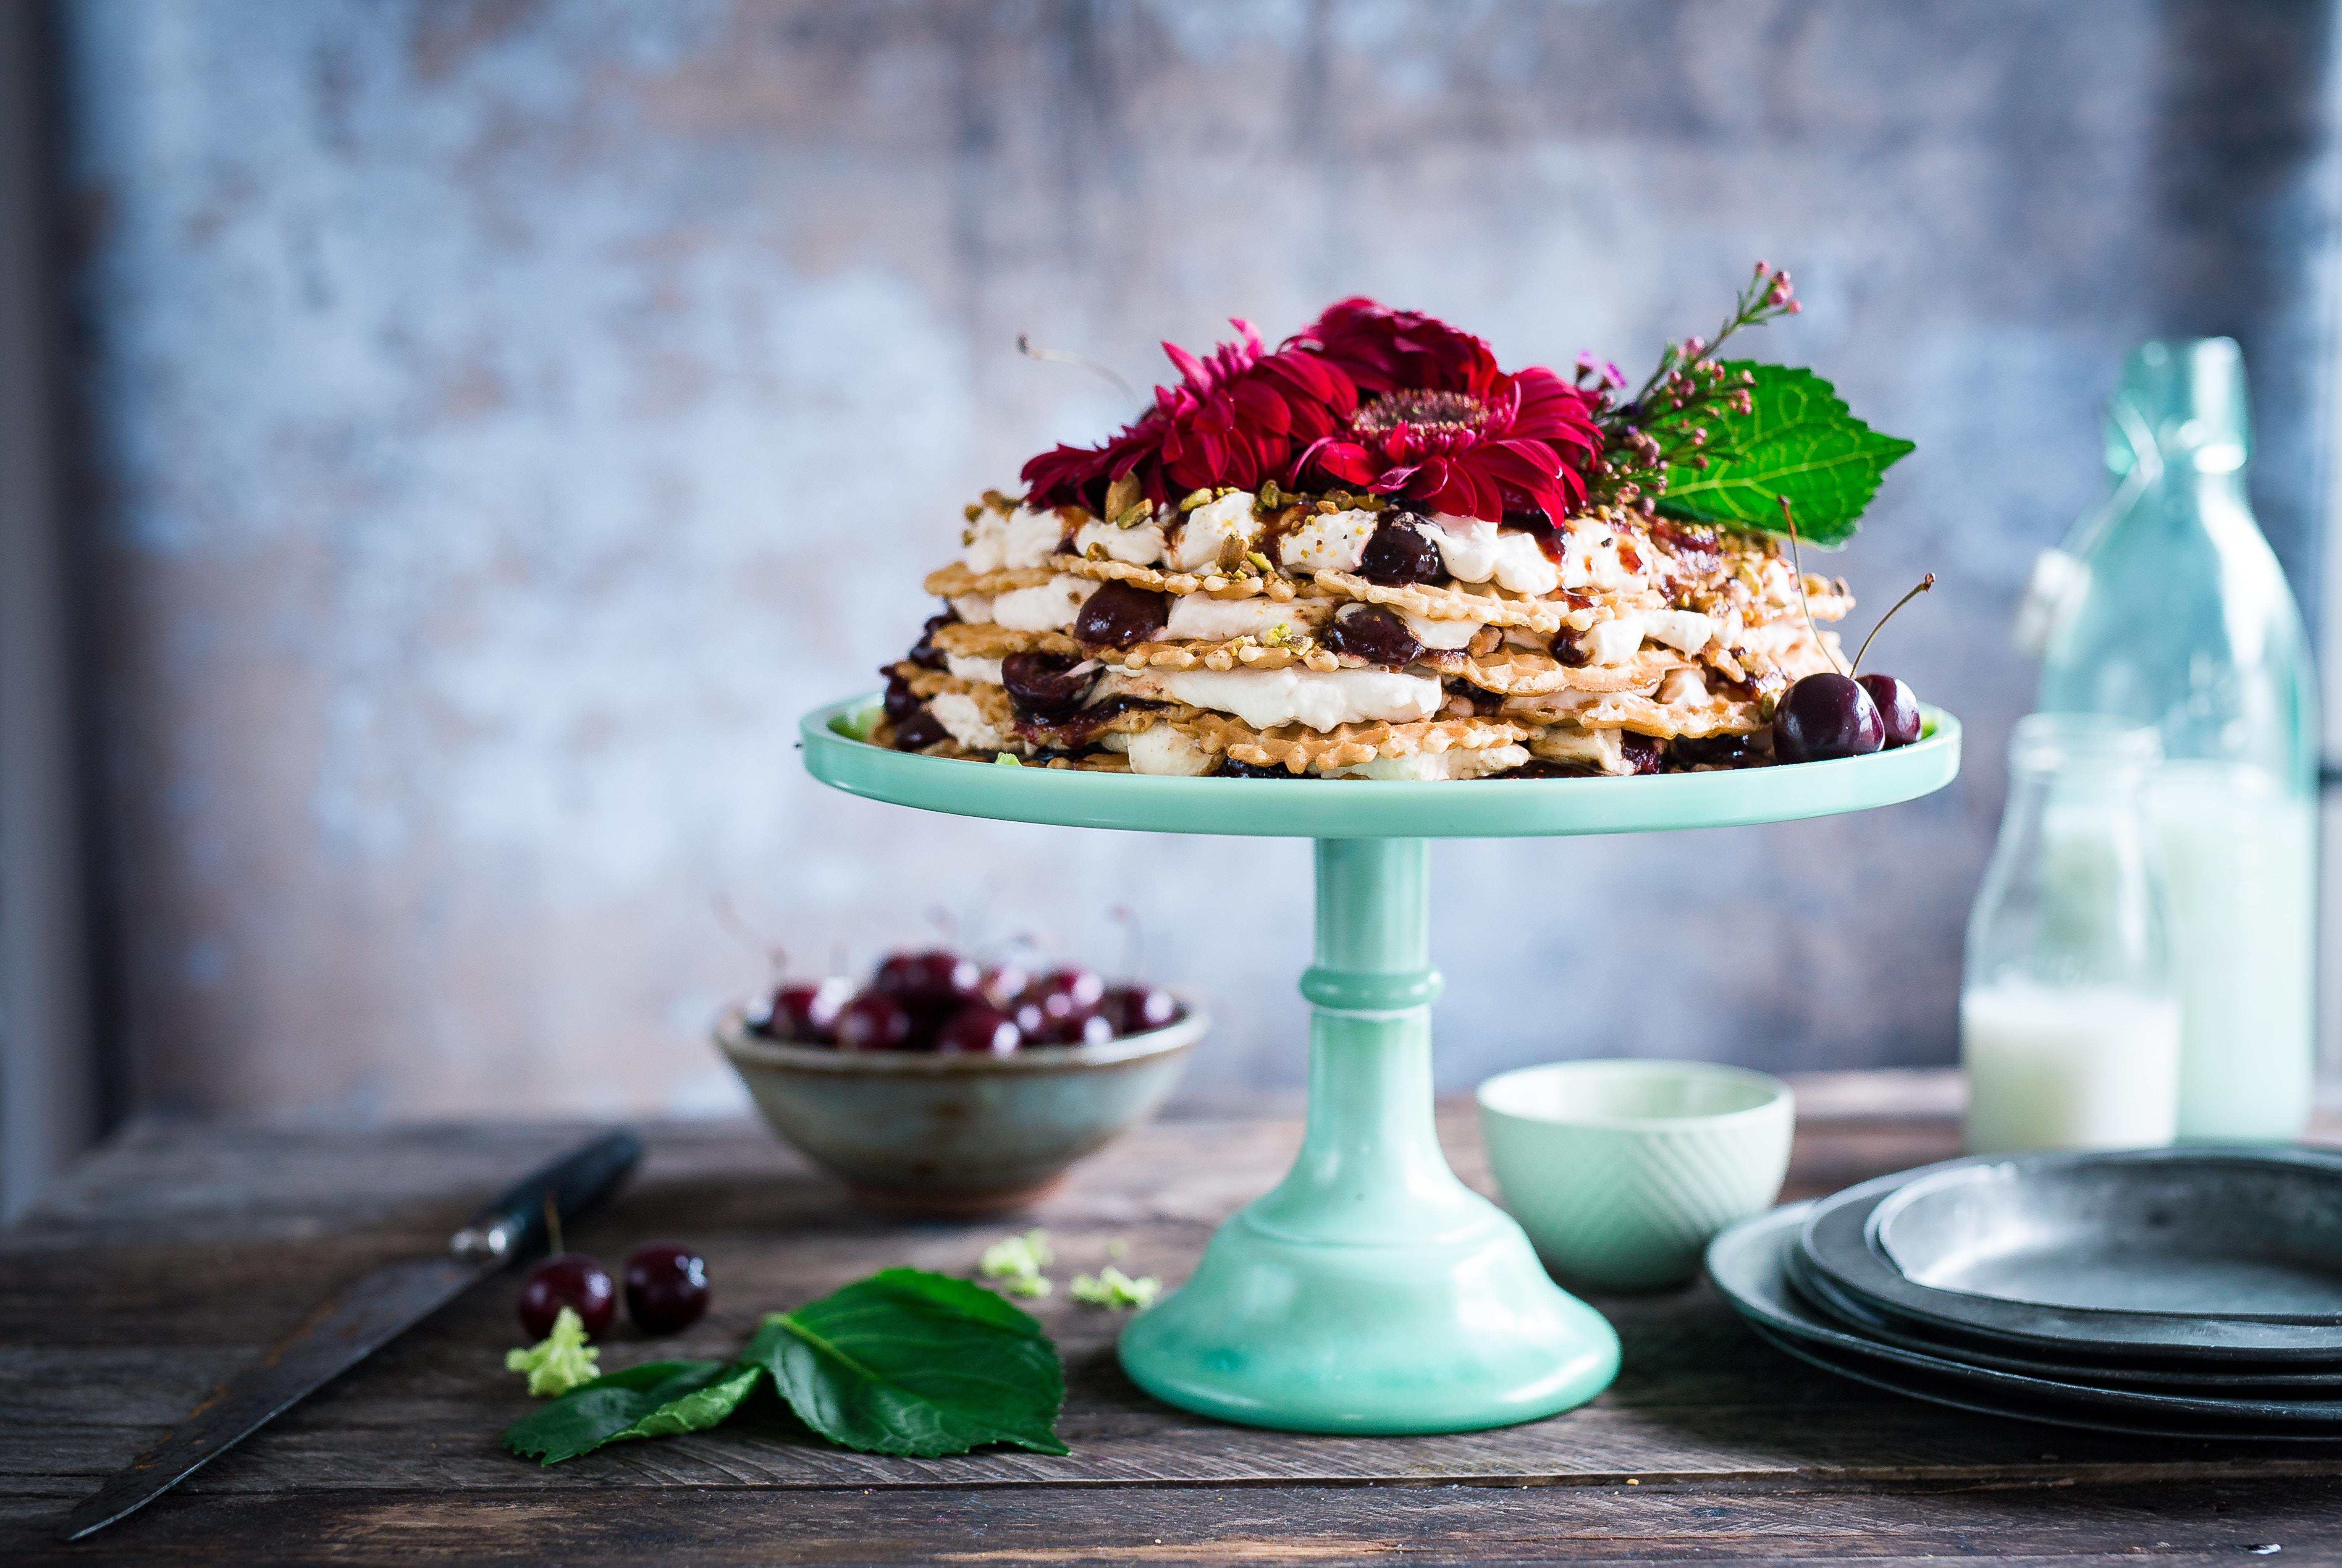 food cake standbybrooke-lark